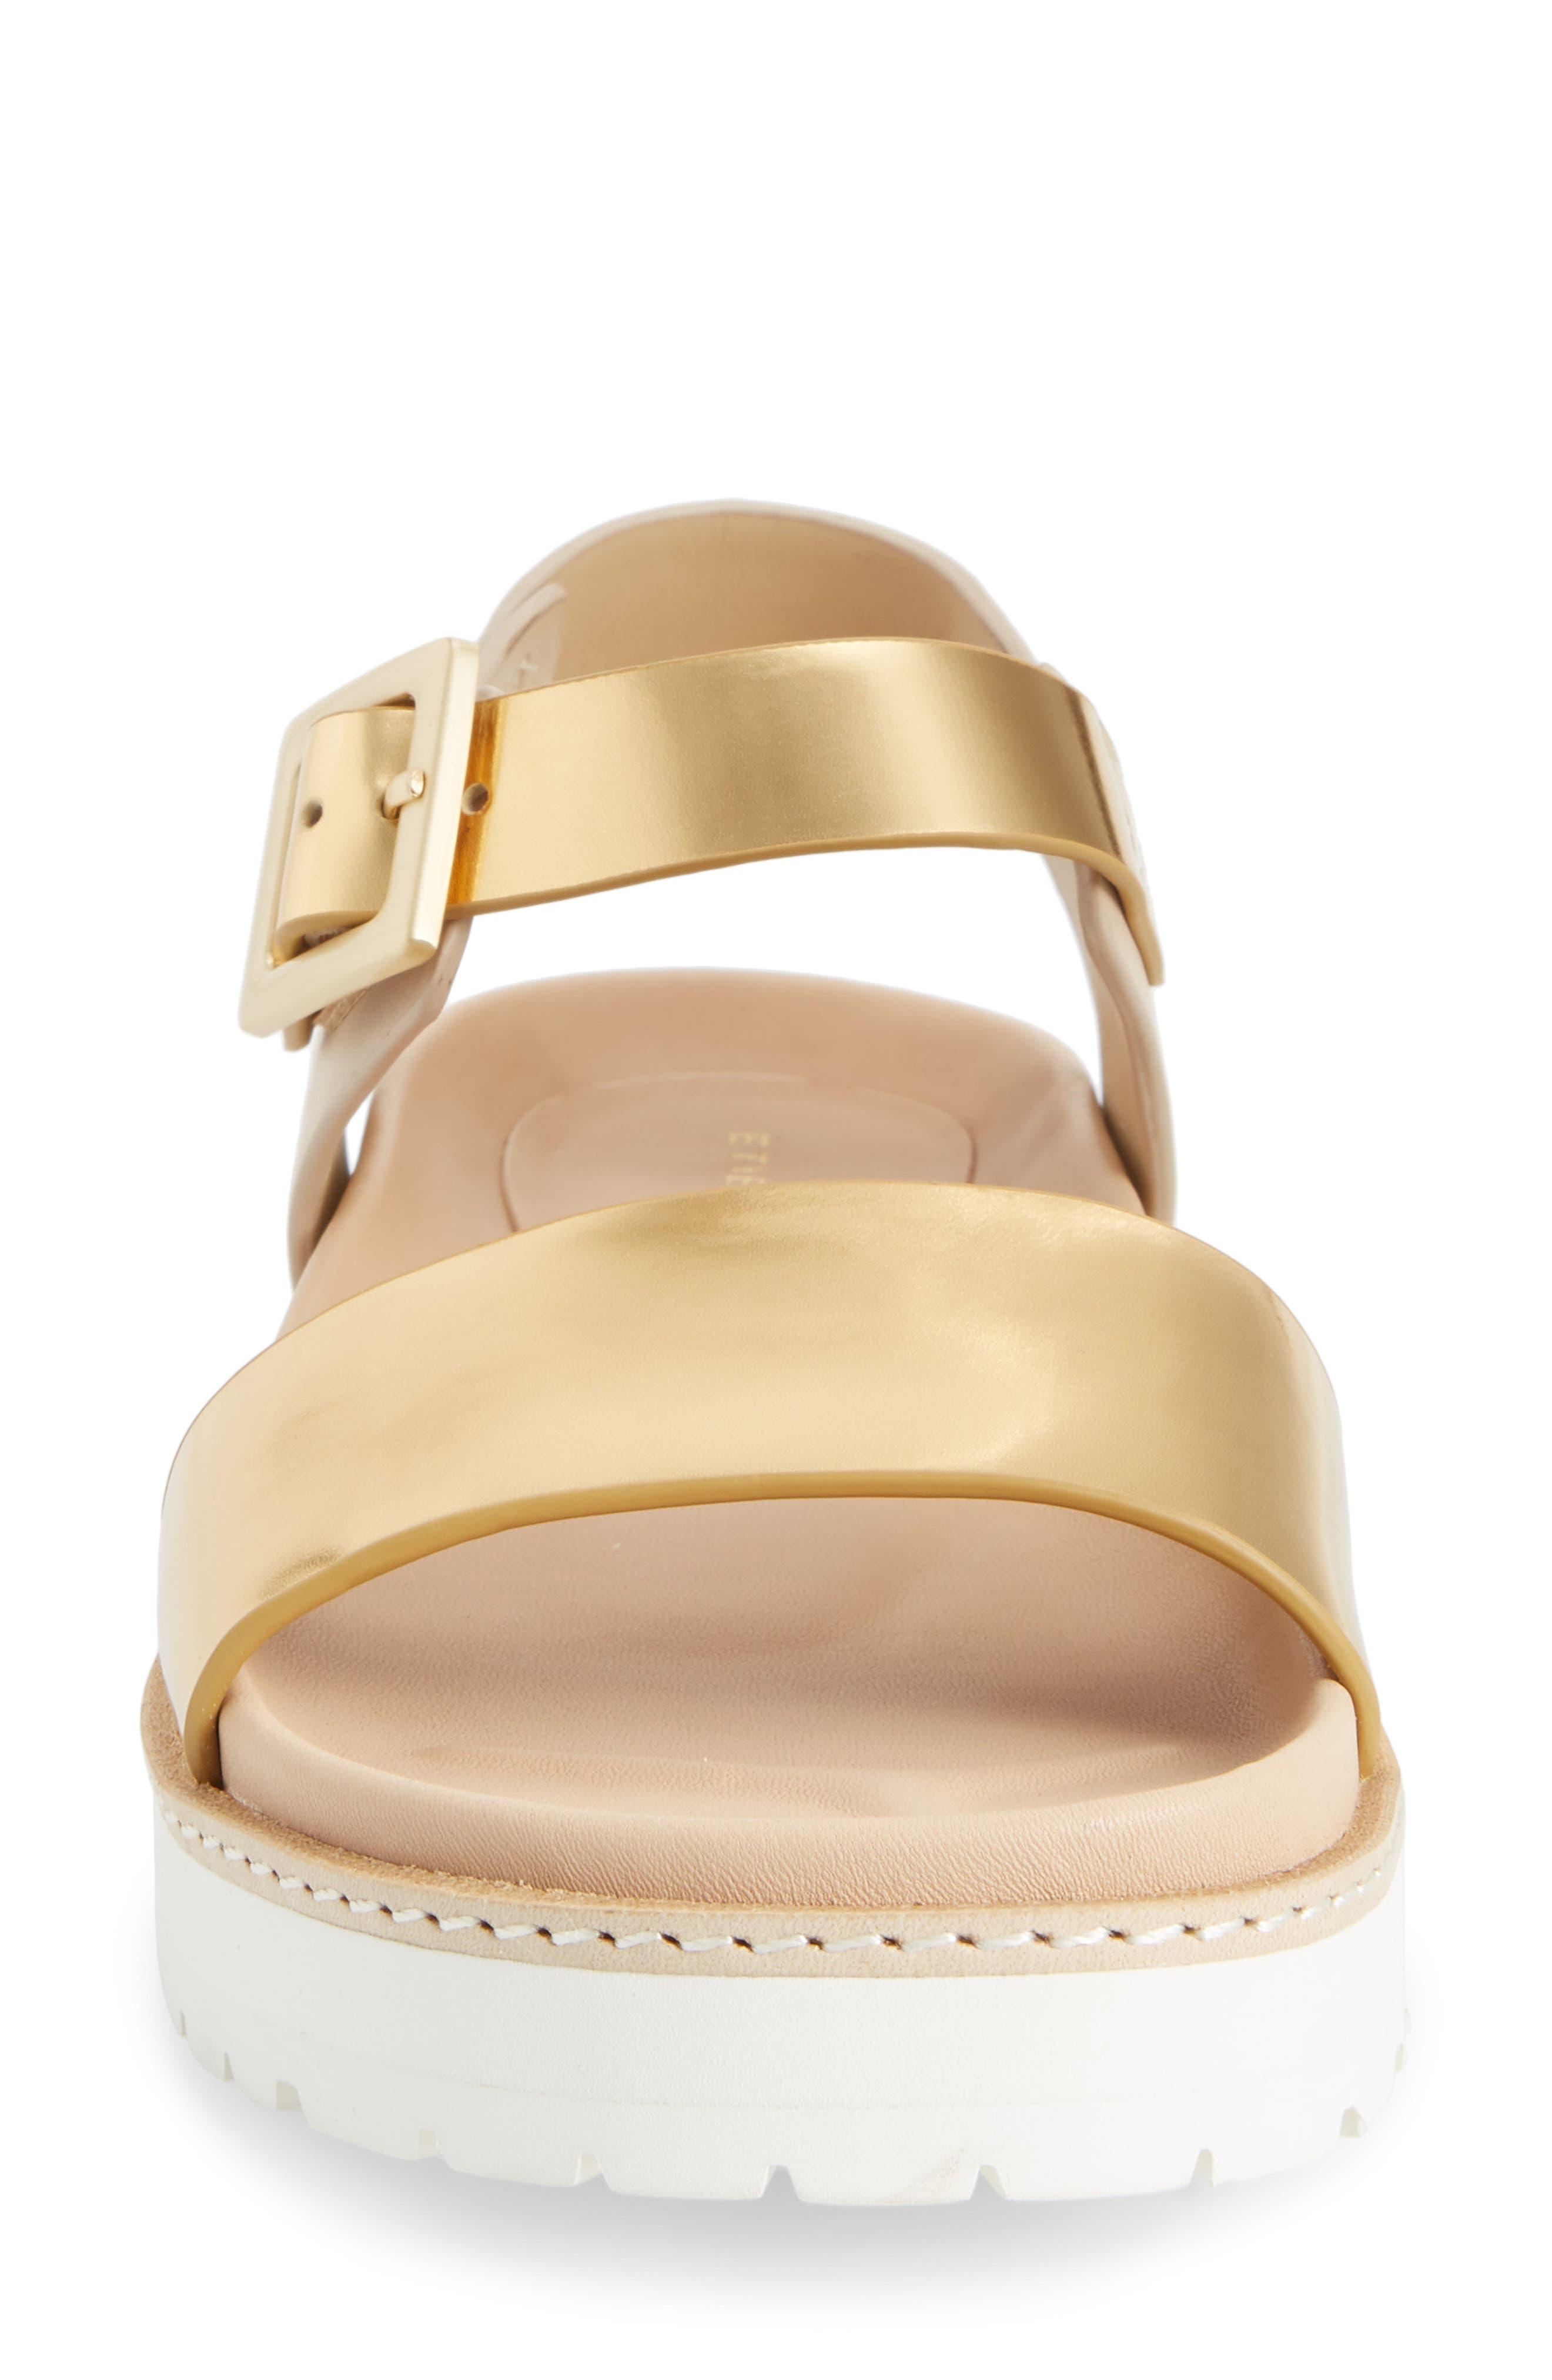 Ange Sandal,                             Alternate thumbnail 4, color,                             Gold/ Natural Leather